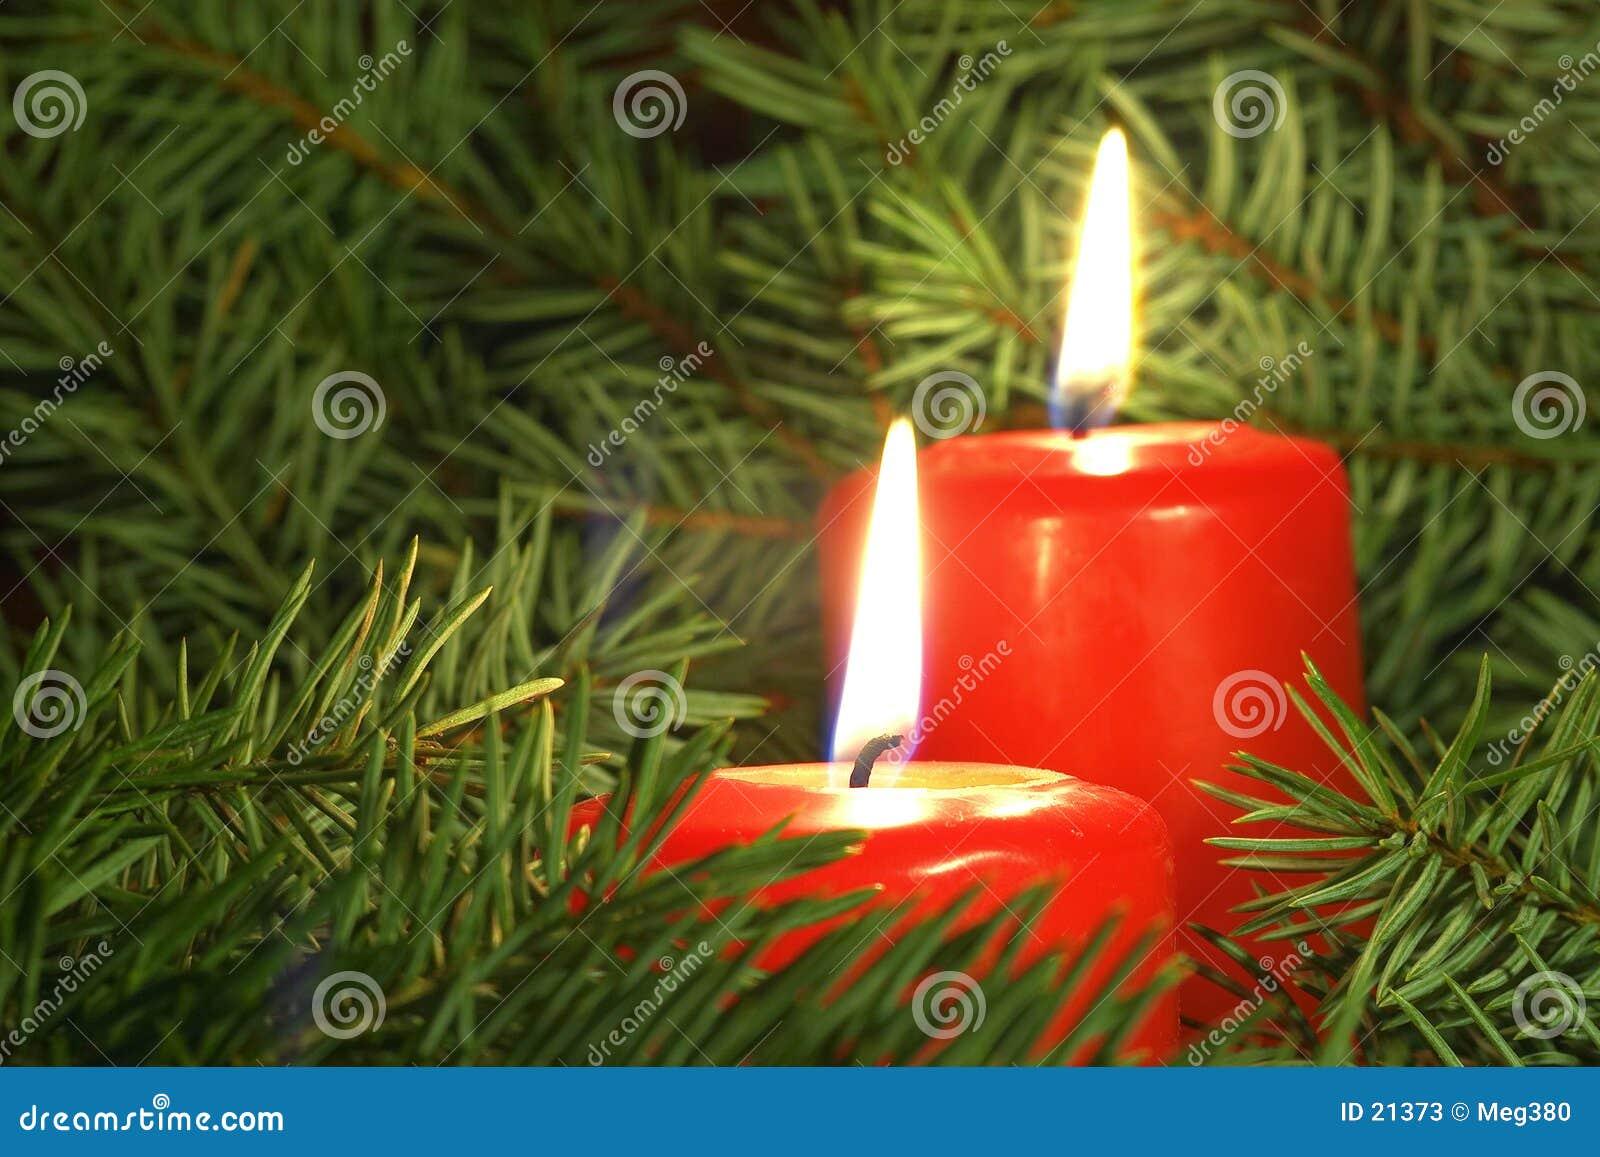 Candele Di Natale Fotografie Stock - Immagine: 21373